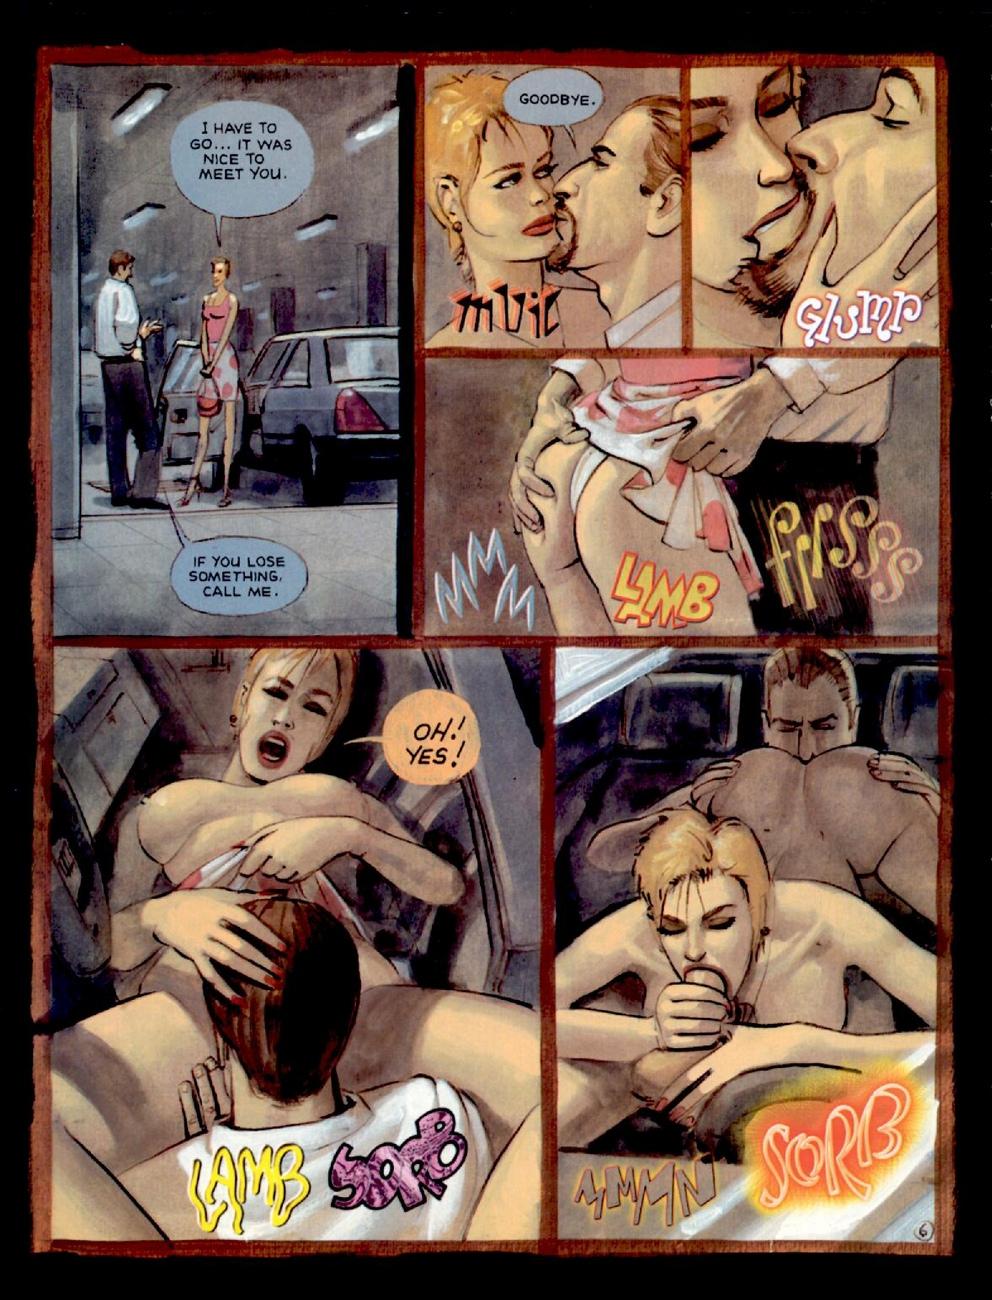 Random-Acts-Of-Kindness 7 free sex comic